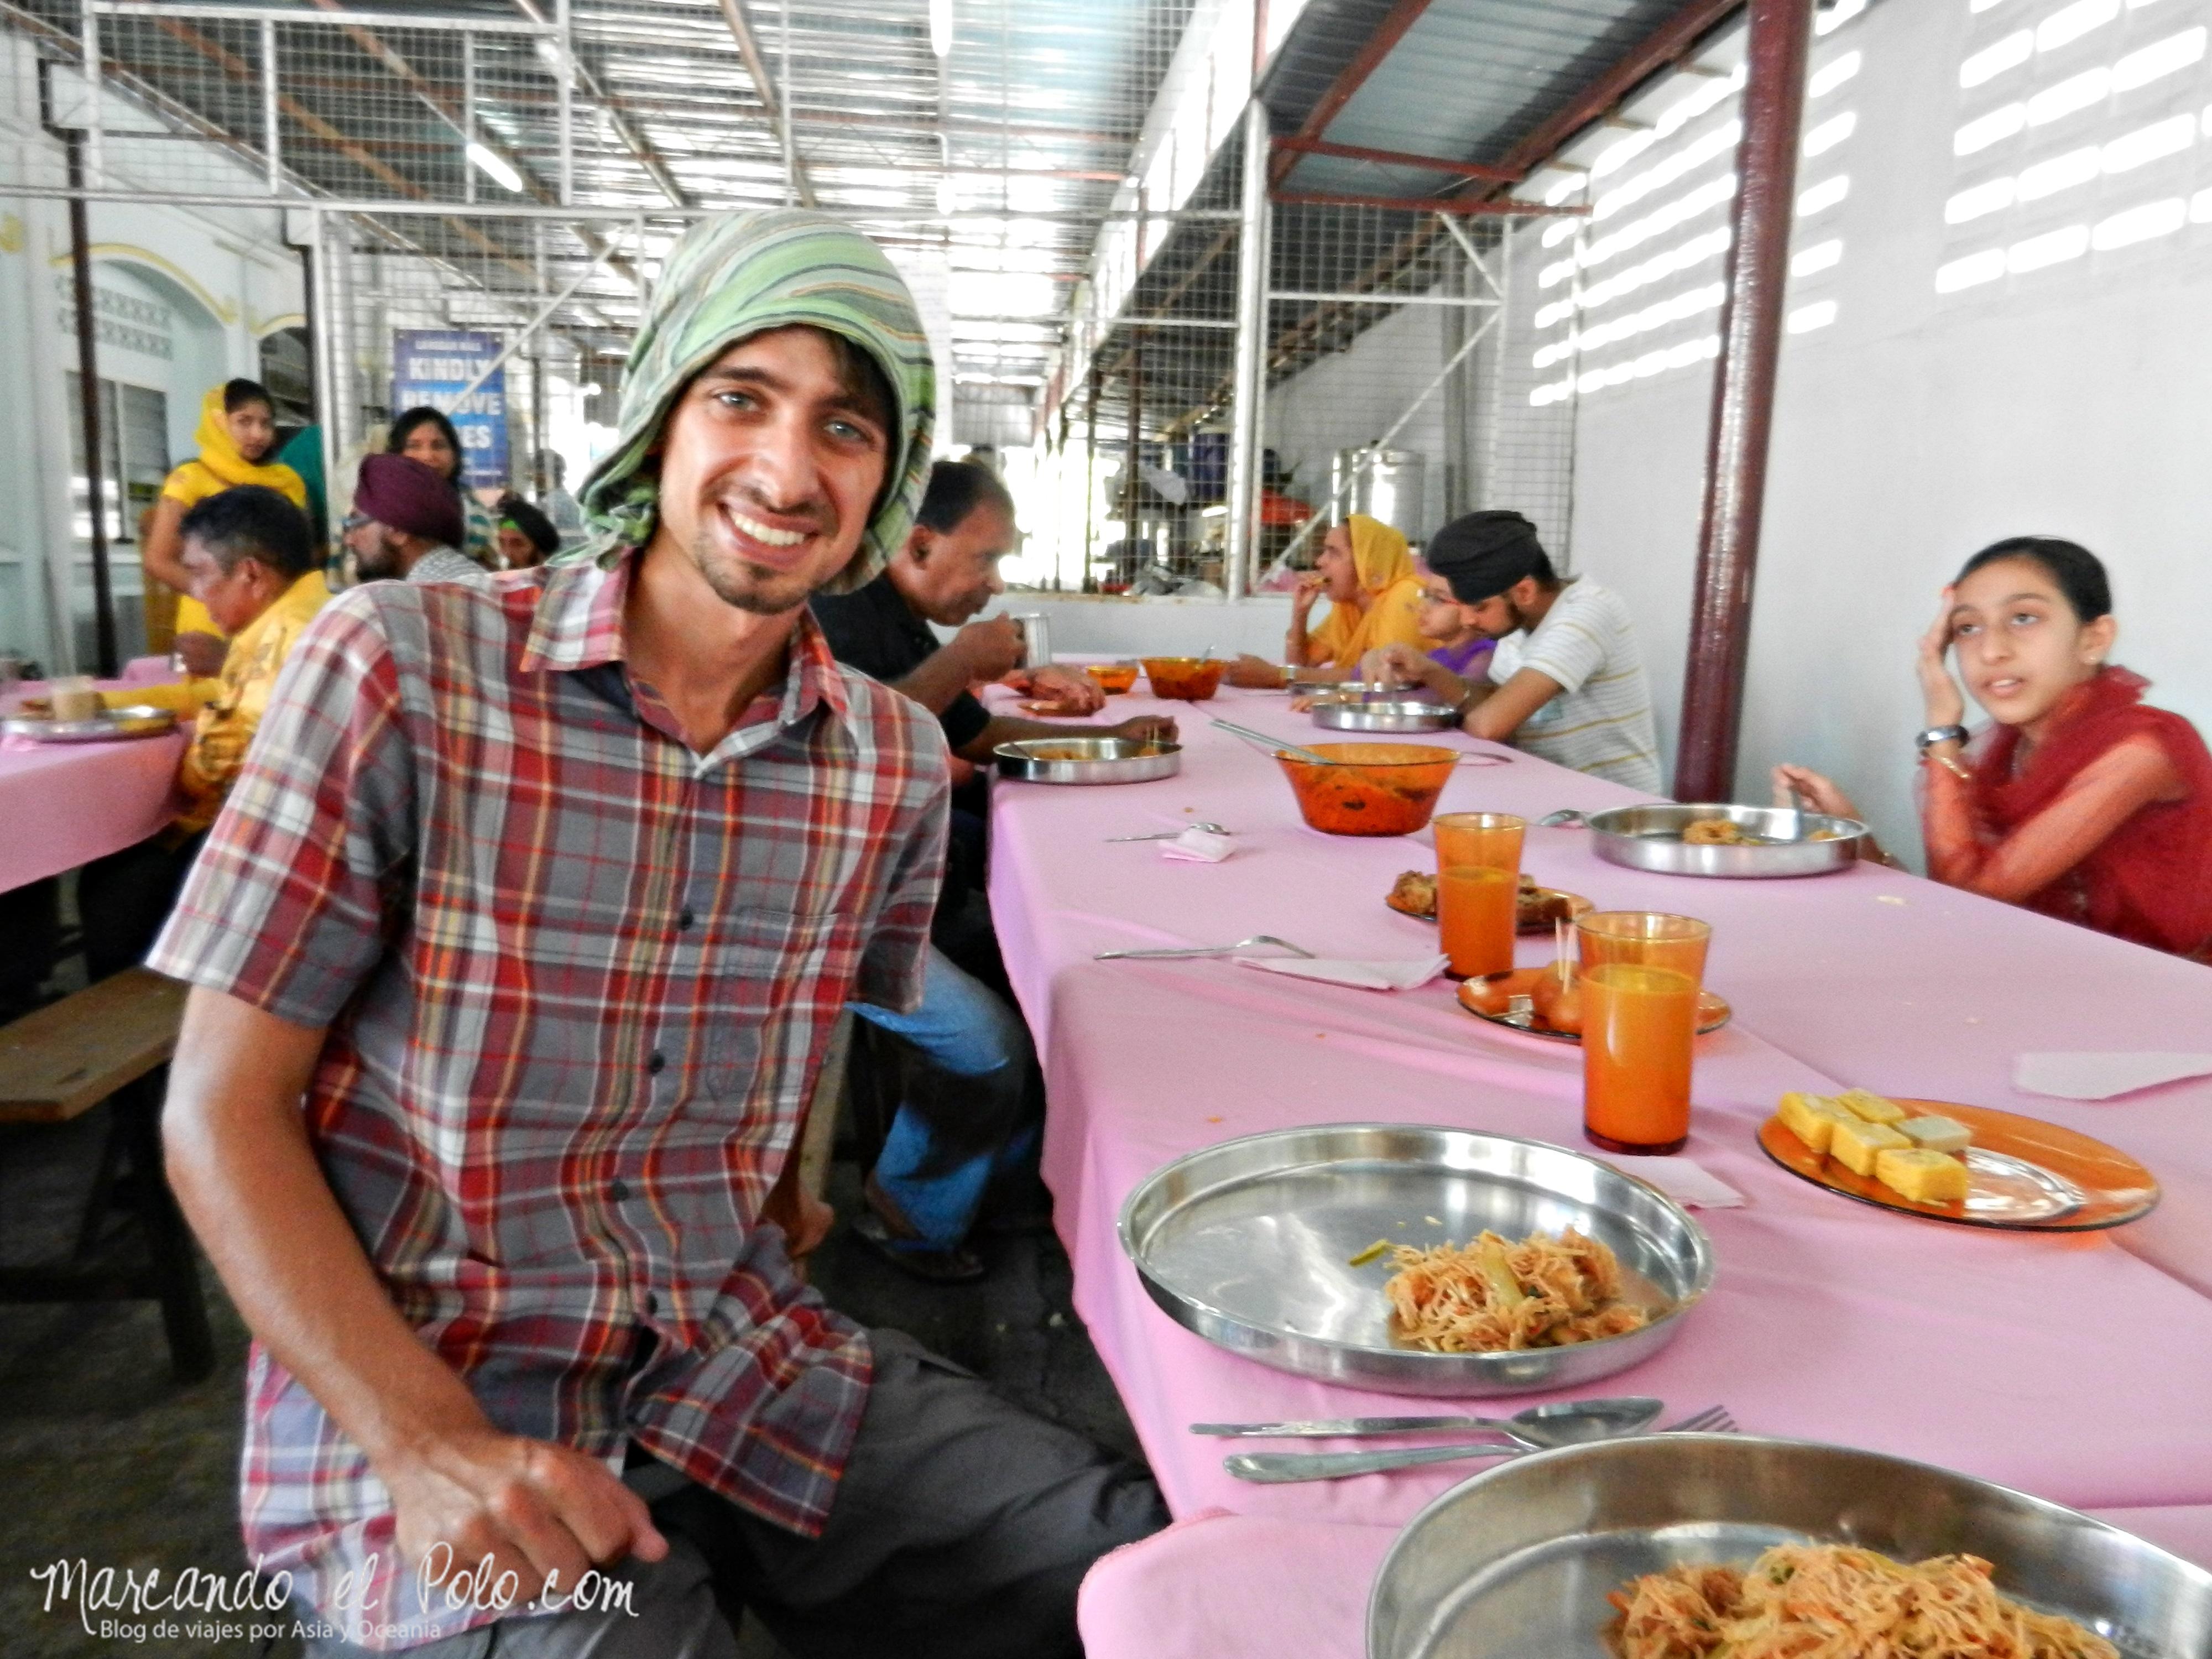 Casamiento Sikh en Penang, Malasia 3